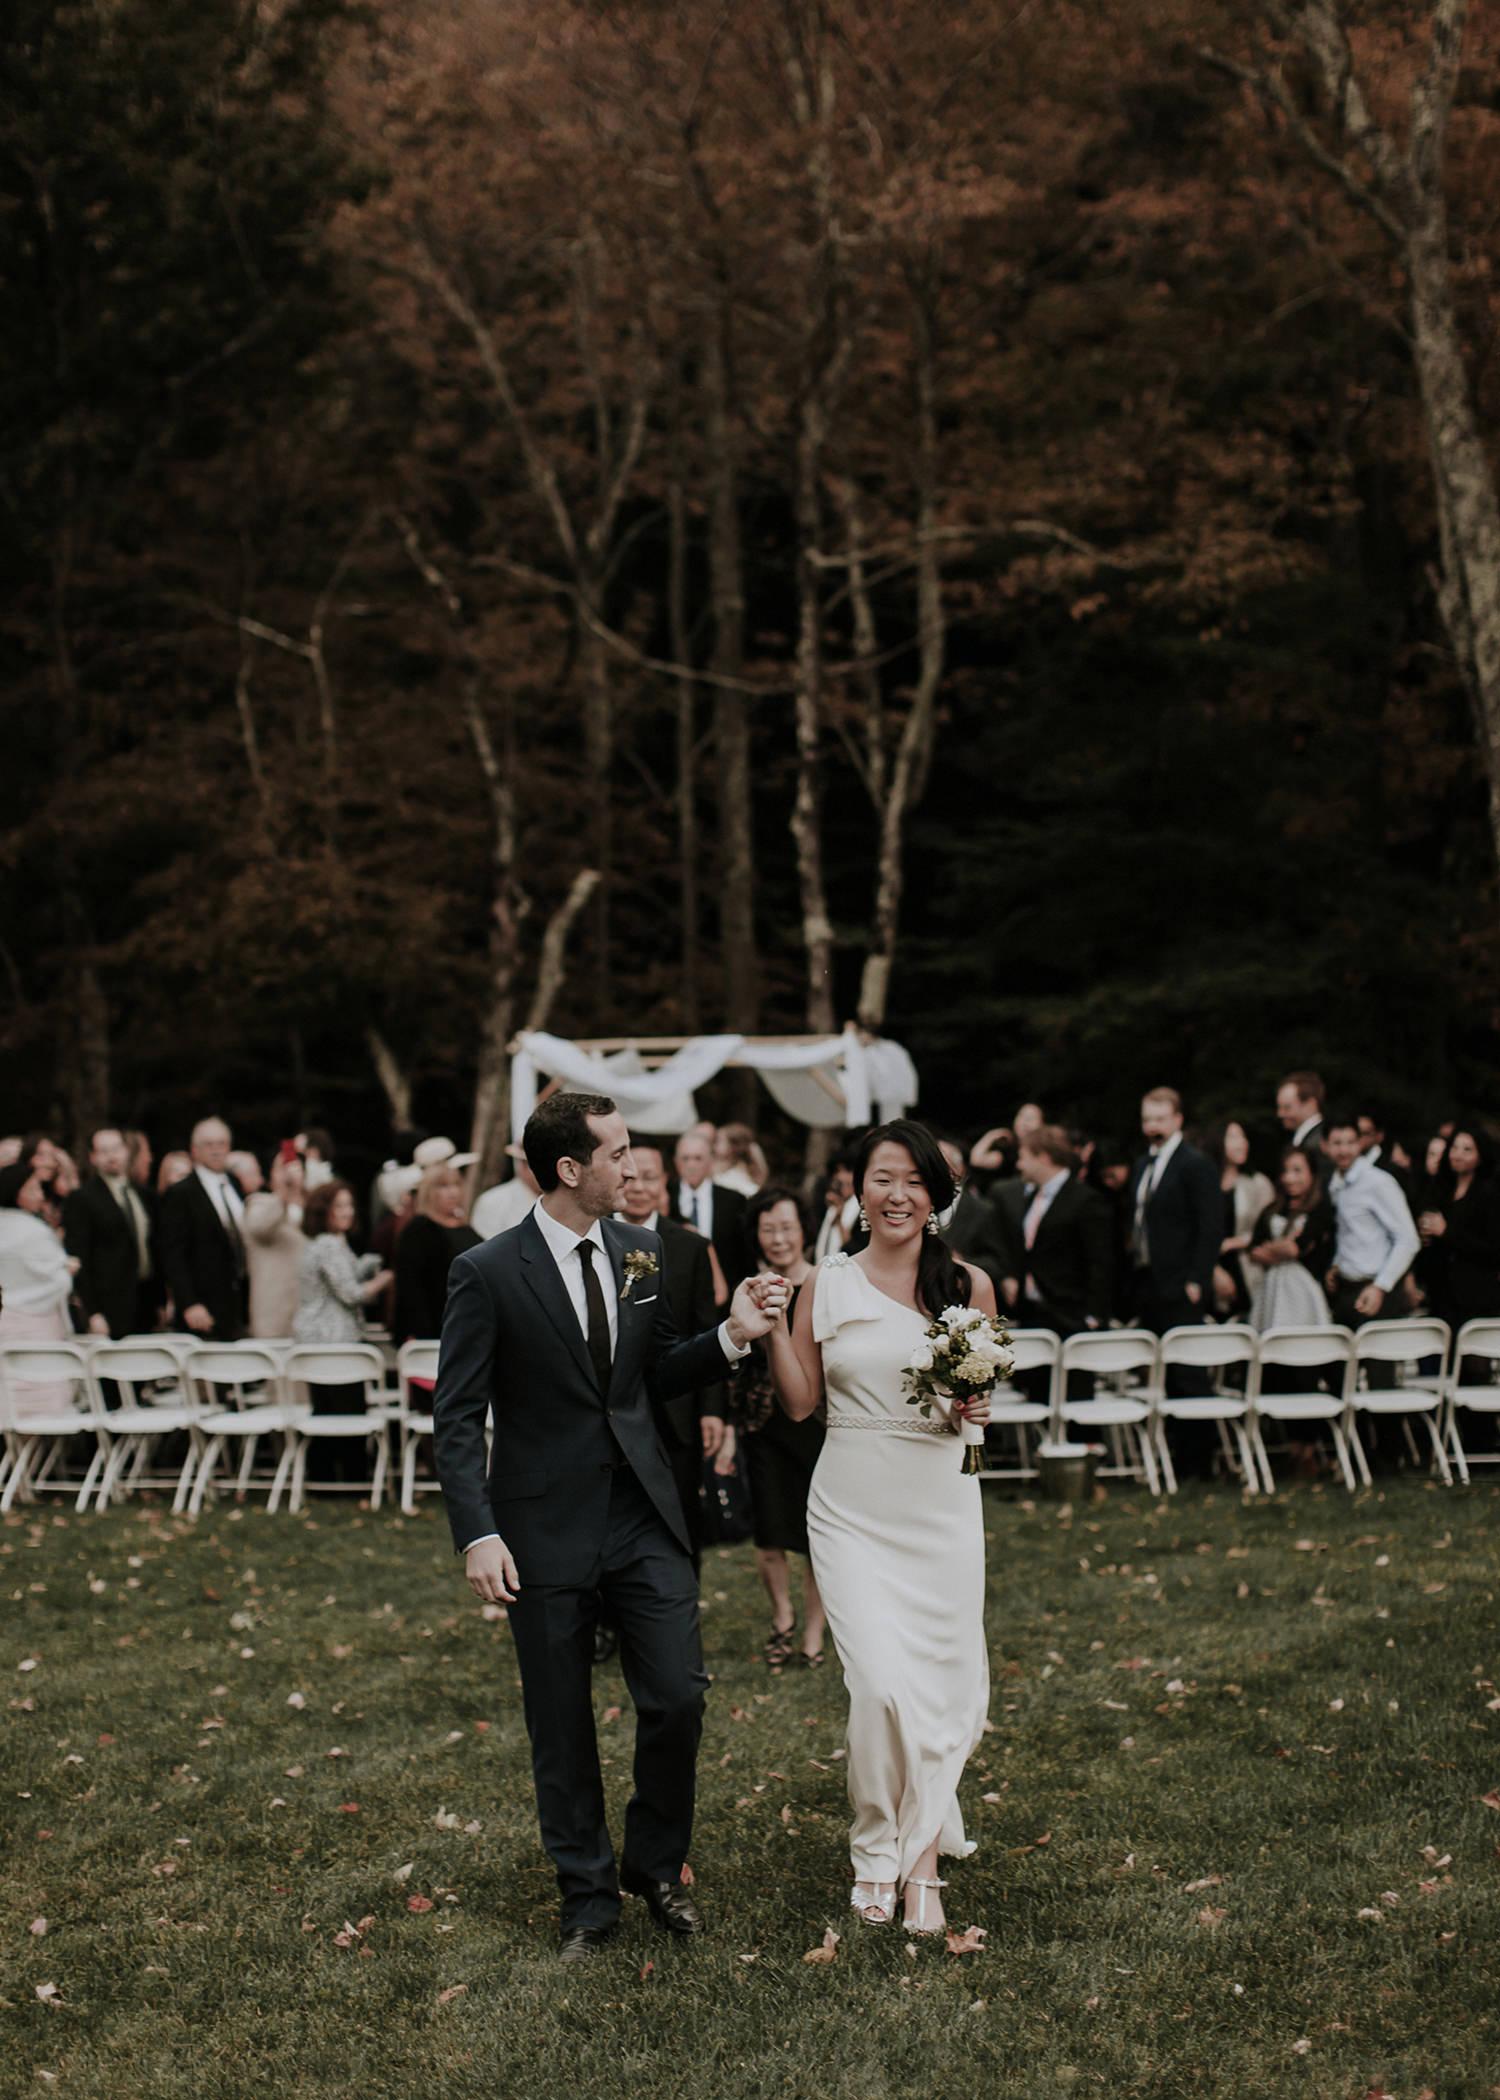 SPENCER+MELISSA-WEDDING558-2.jpg